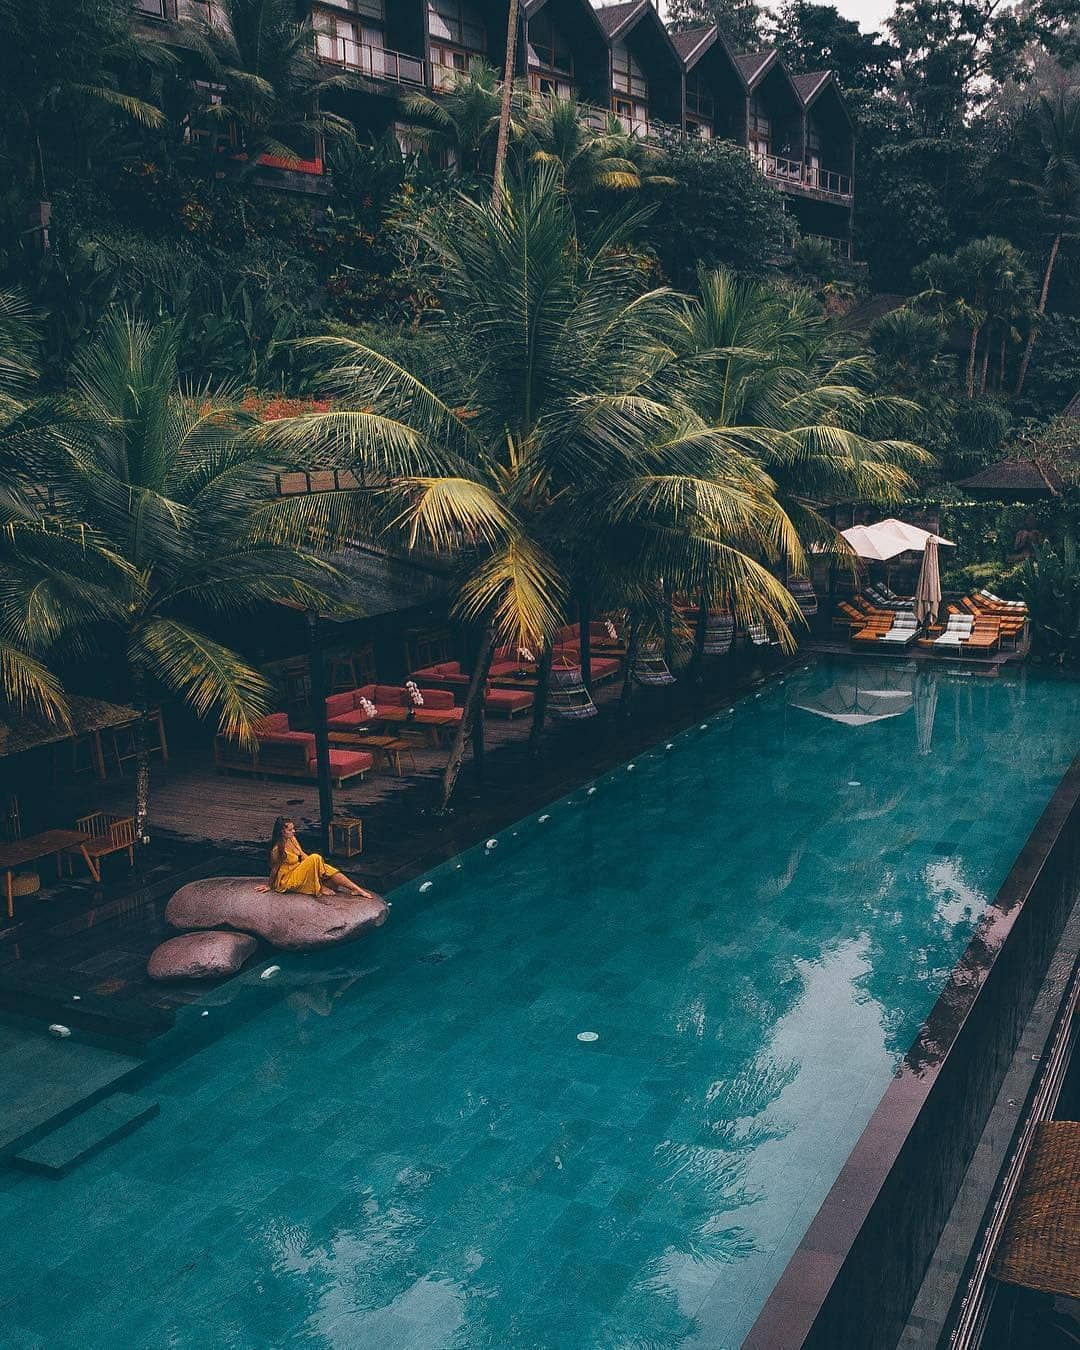 This Jungle Paradise 😍👌 📍Jungle Fish , Bali